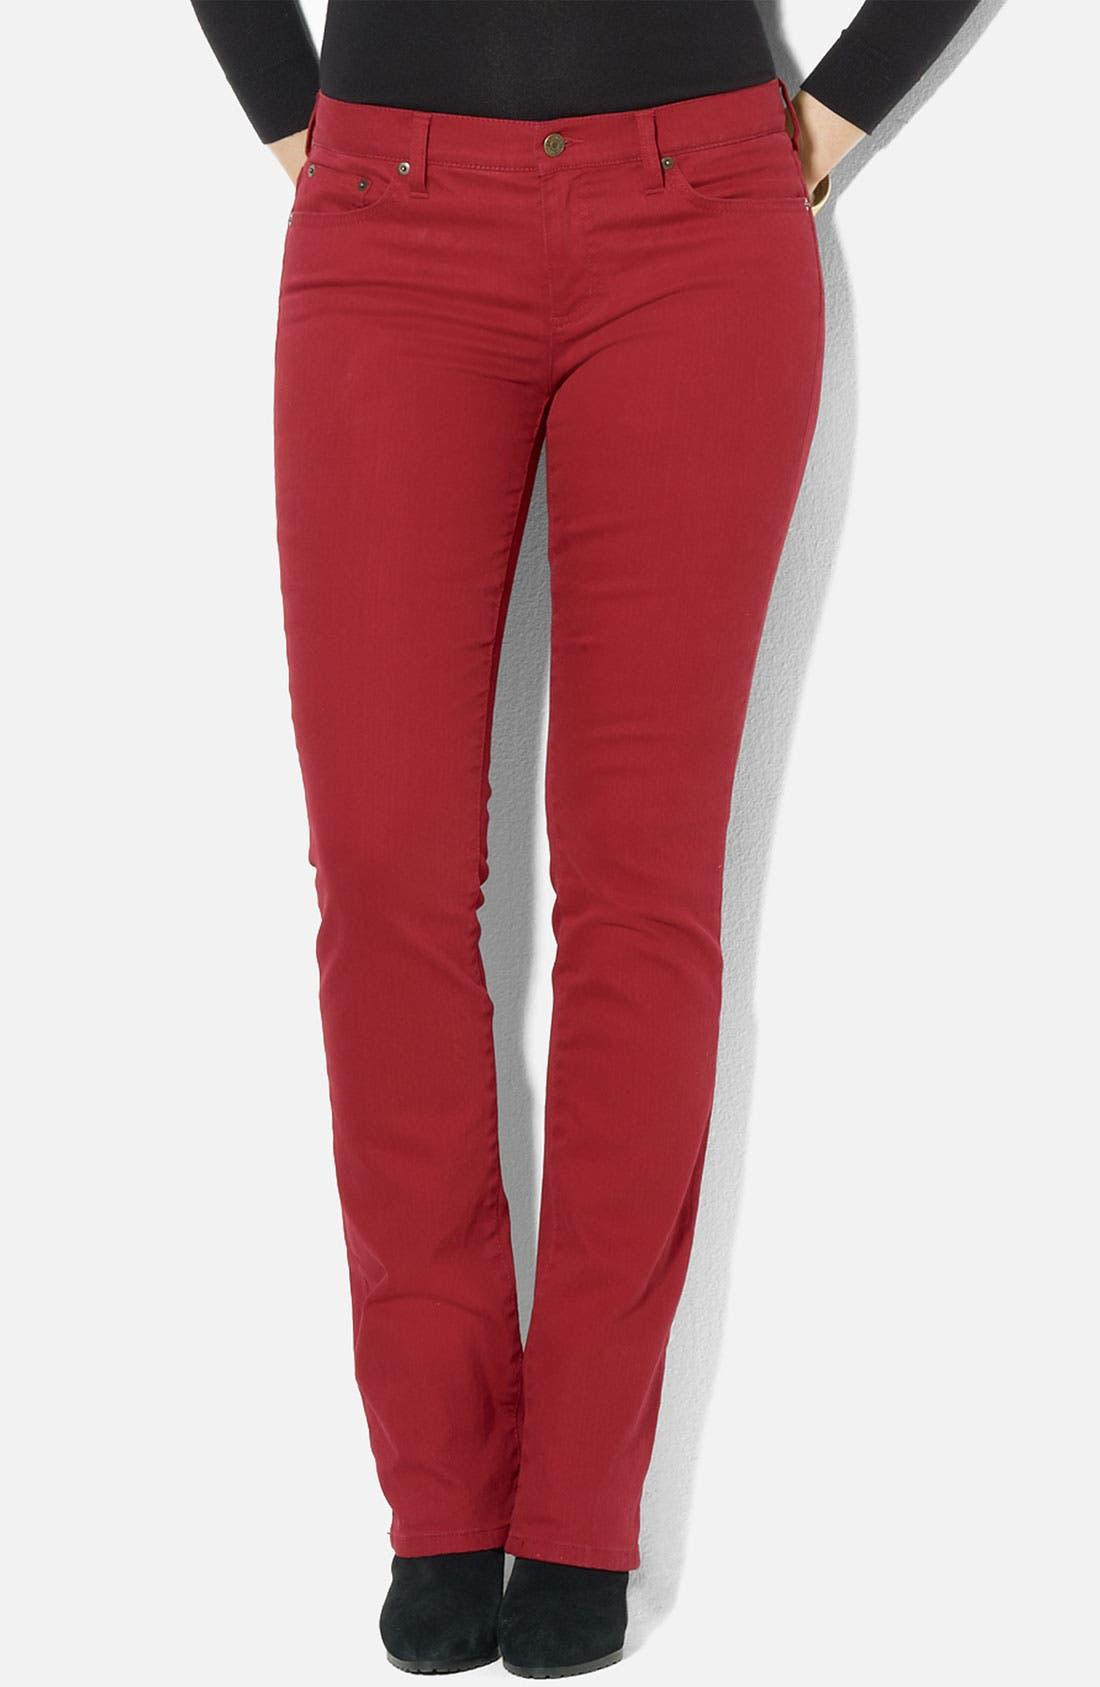 Main Image - Lauren Ralph Lauren Slim Straight Leg Colored Jeans (Petite) (Online Exclusive)